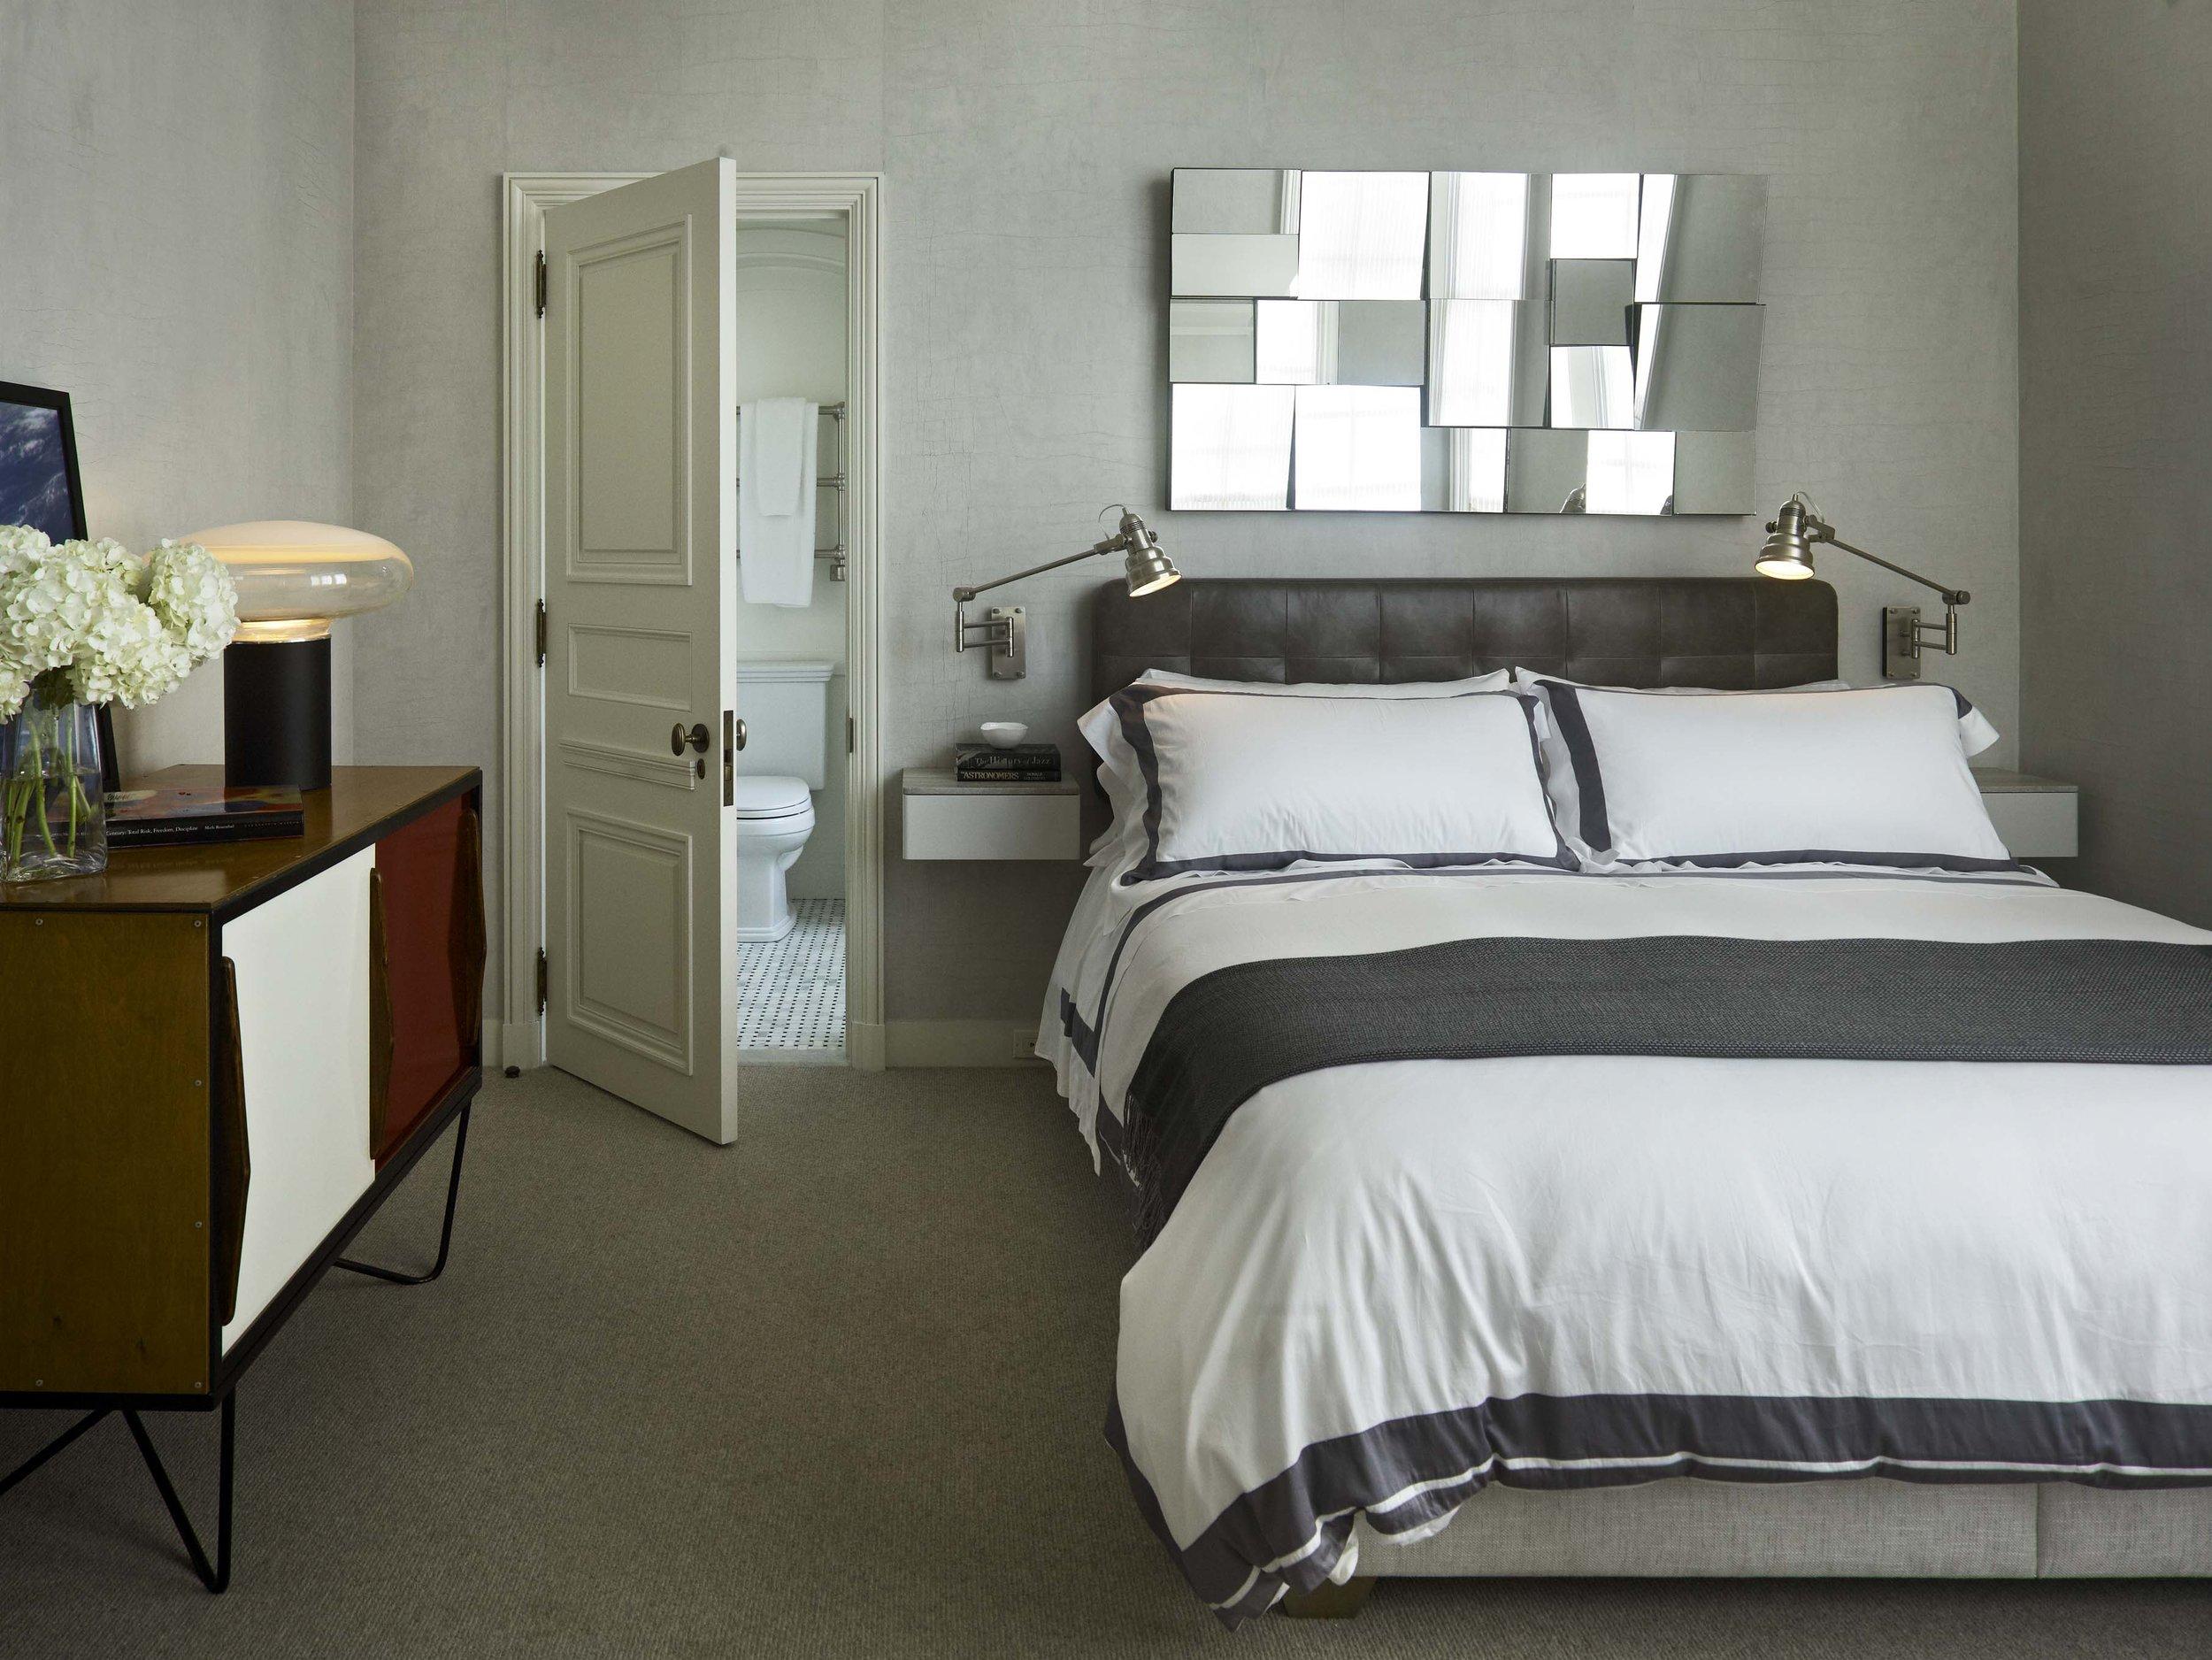 Lakeshore Drive Apartment Guest Room